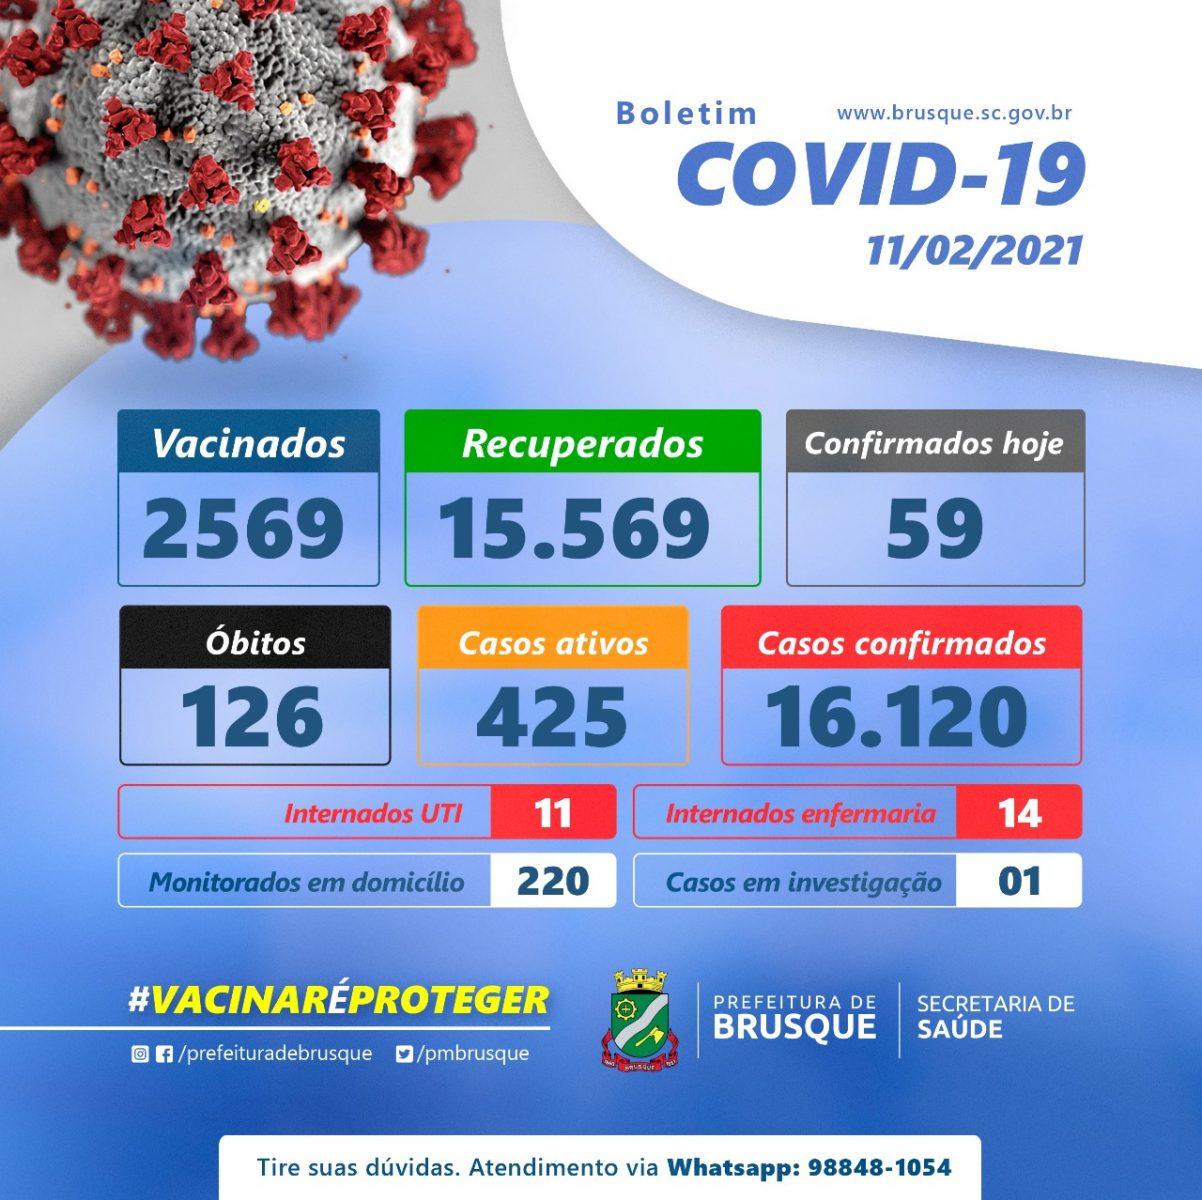 Covid-19: Confira o boletim epidemiológico desta quinta-feira (11)